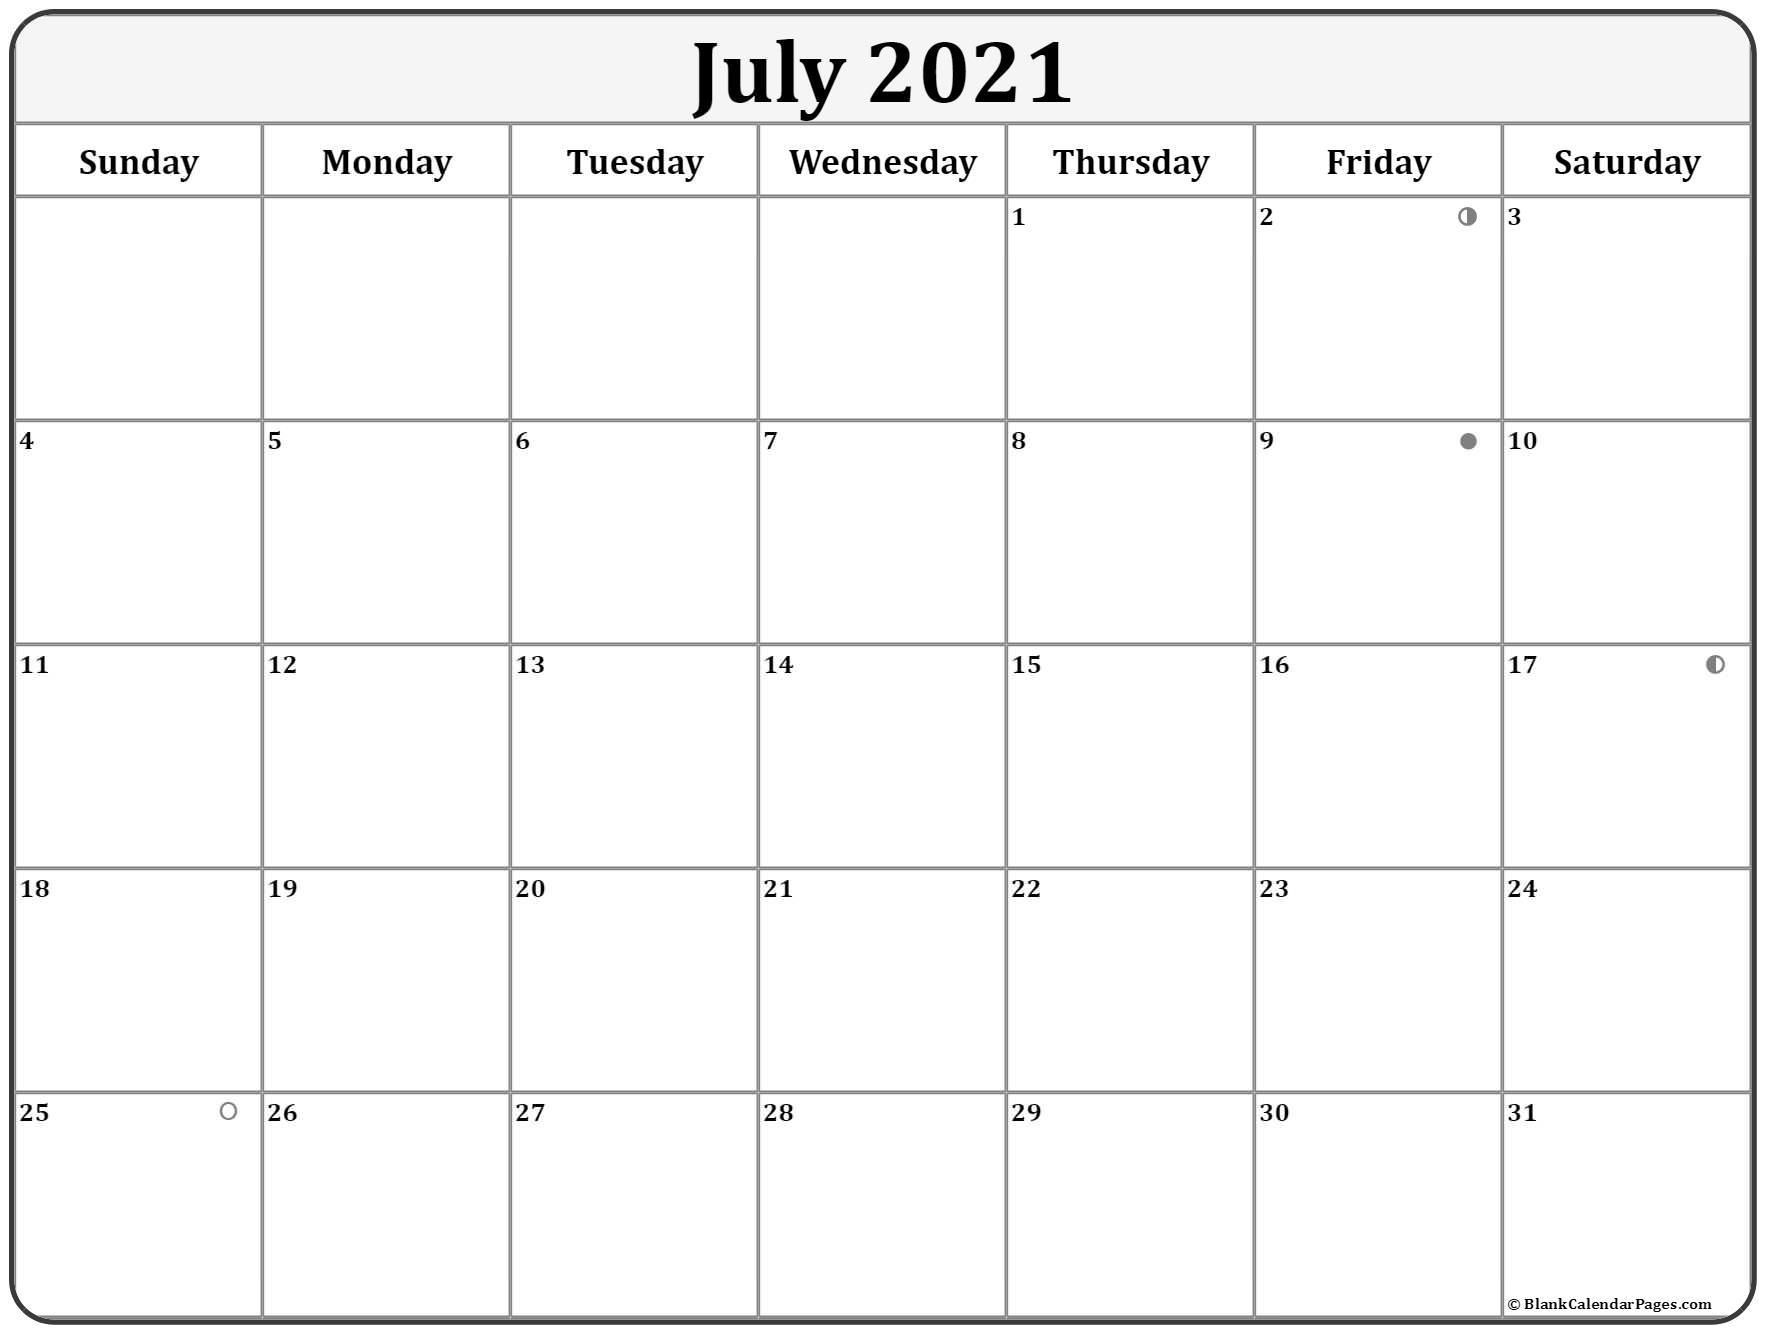 July 2021 Lunar Calendar | Moon Phase Calendar With Regard To Moon Phase Deer Hunting Chart 2021